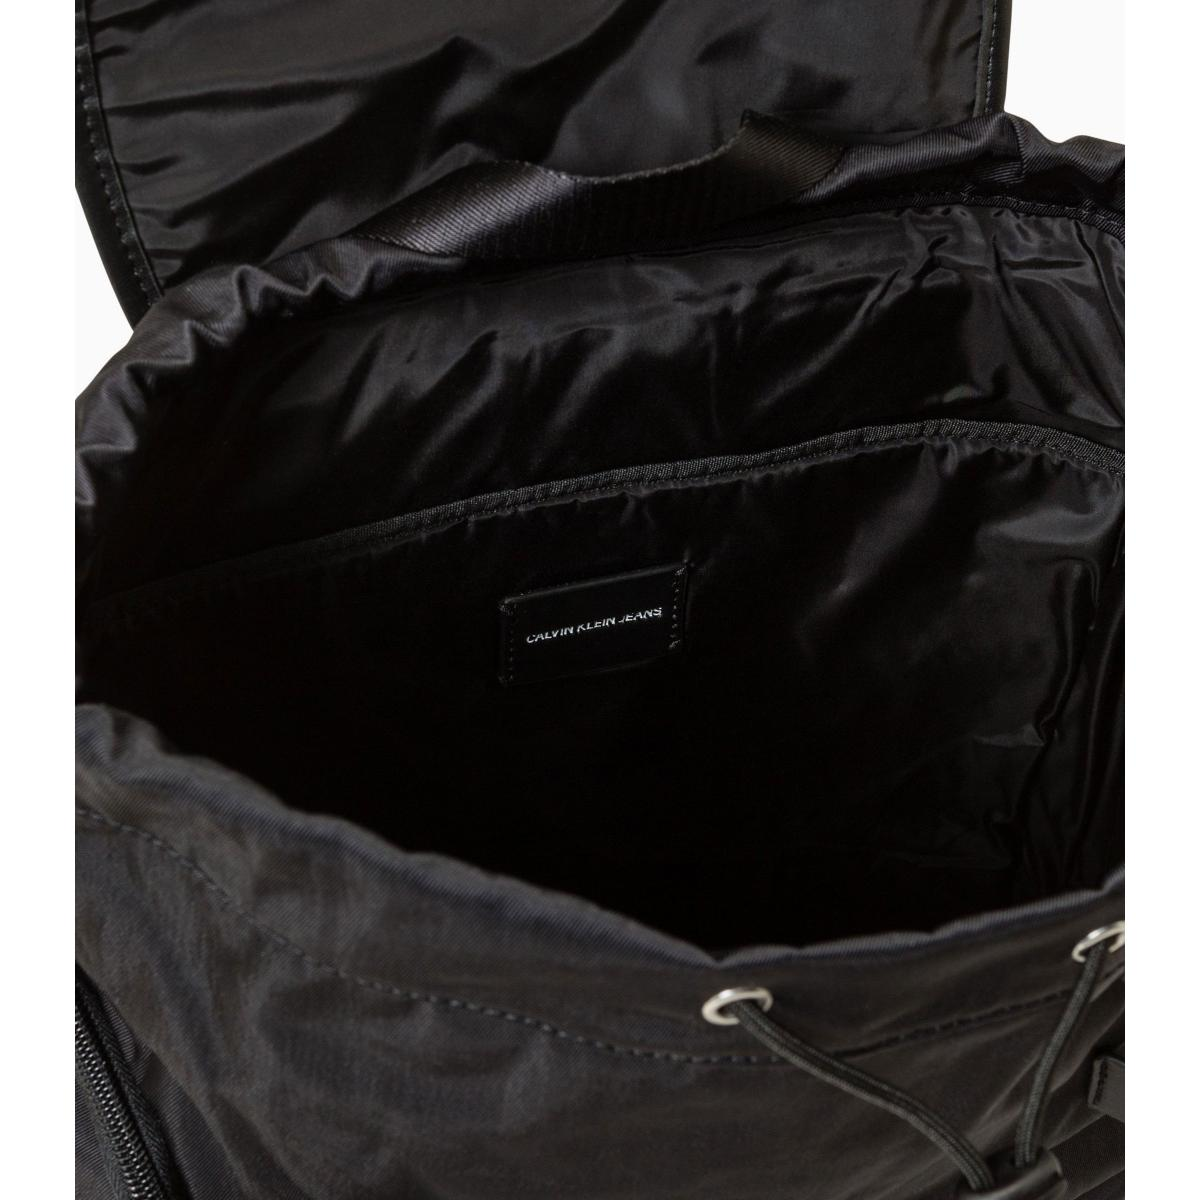 Zaino Calvin Klein Jeans in twill di nylon con logo ricamato unisex rif. K50K504736